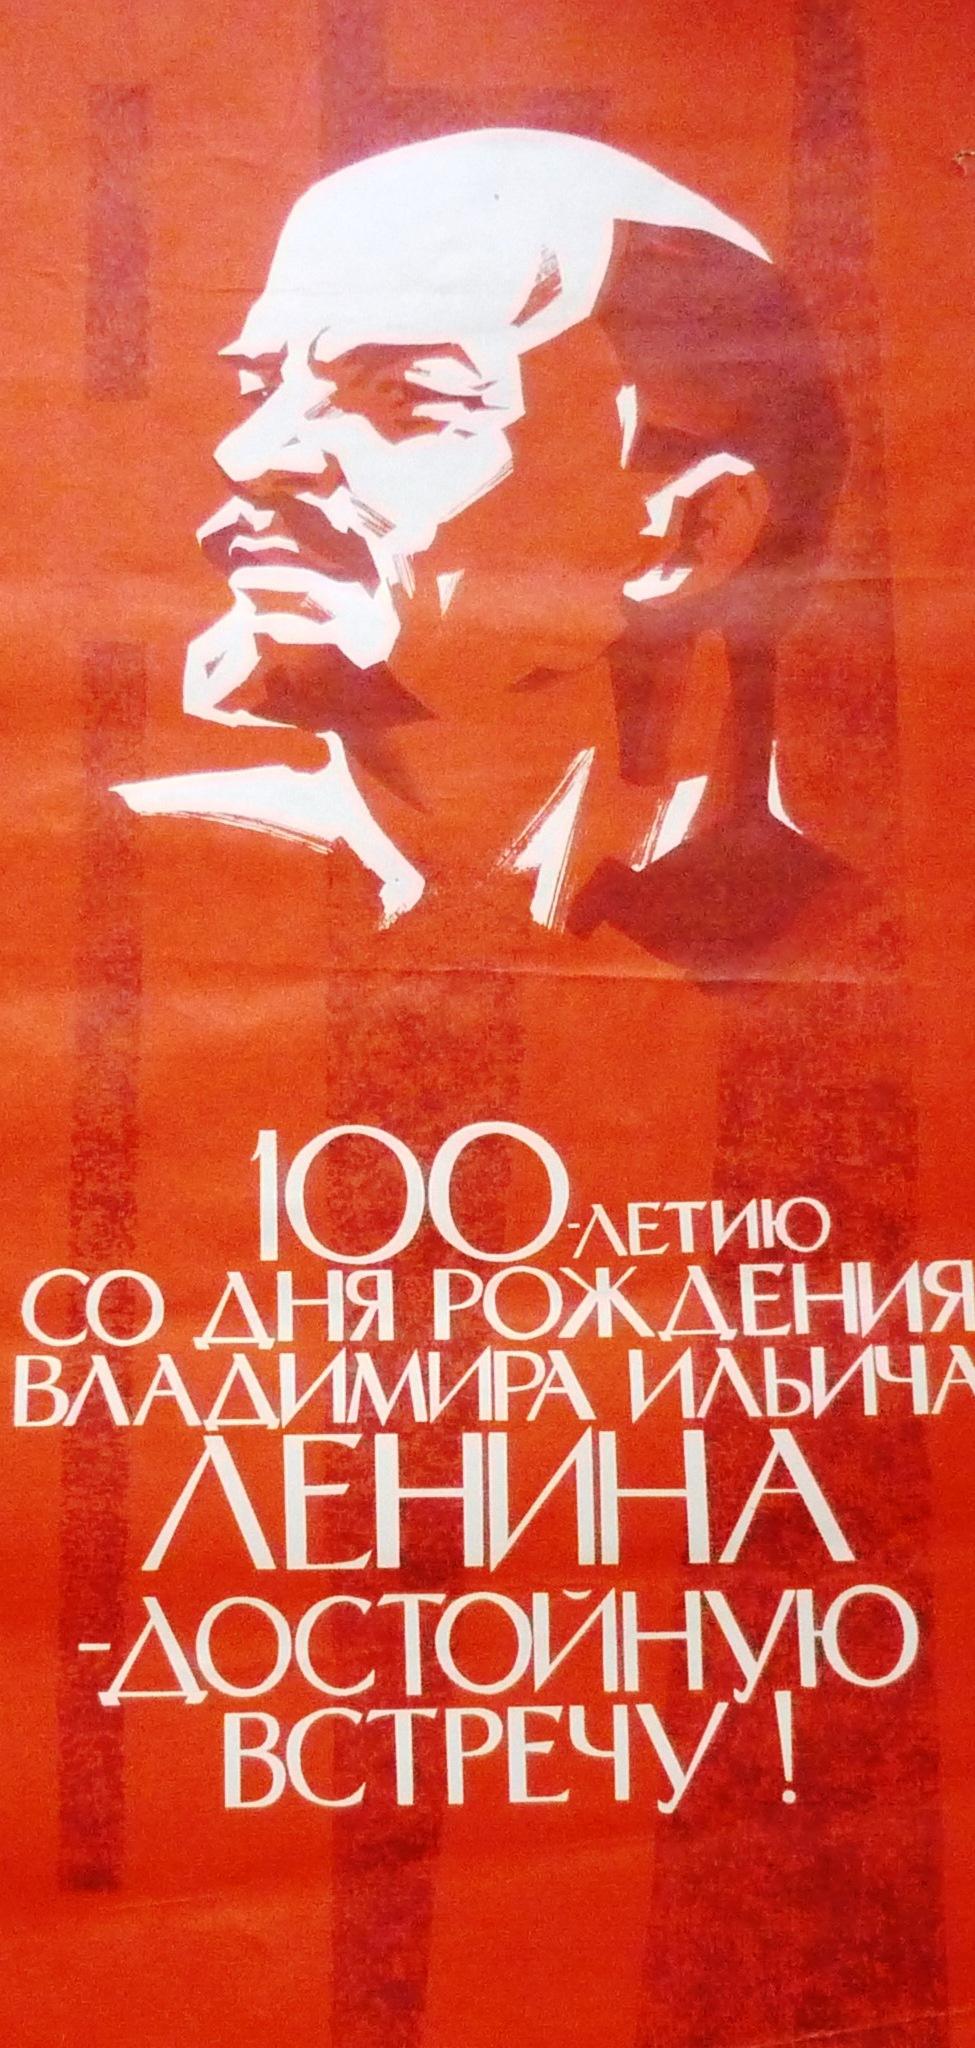 G. Illarionov. 100th anniversary of the birth of Lenin, a worthy meeting!